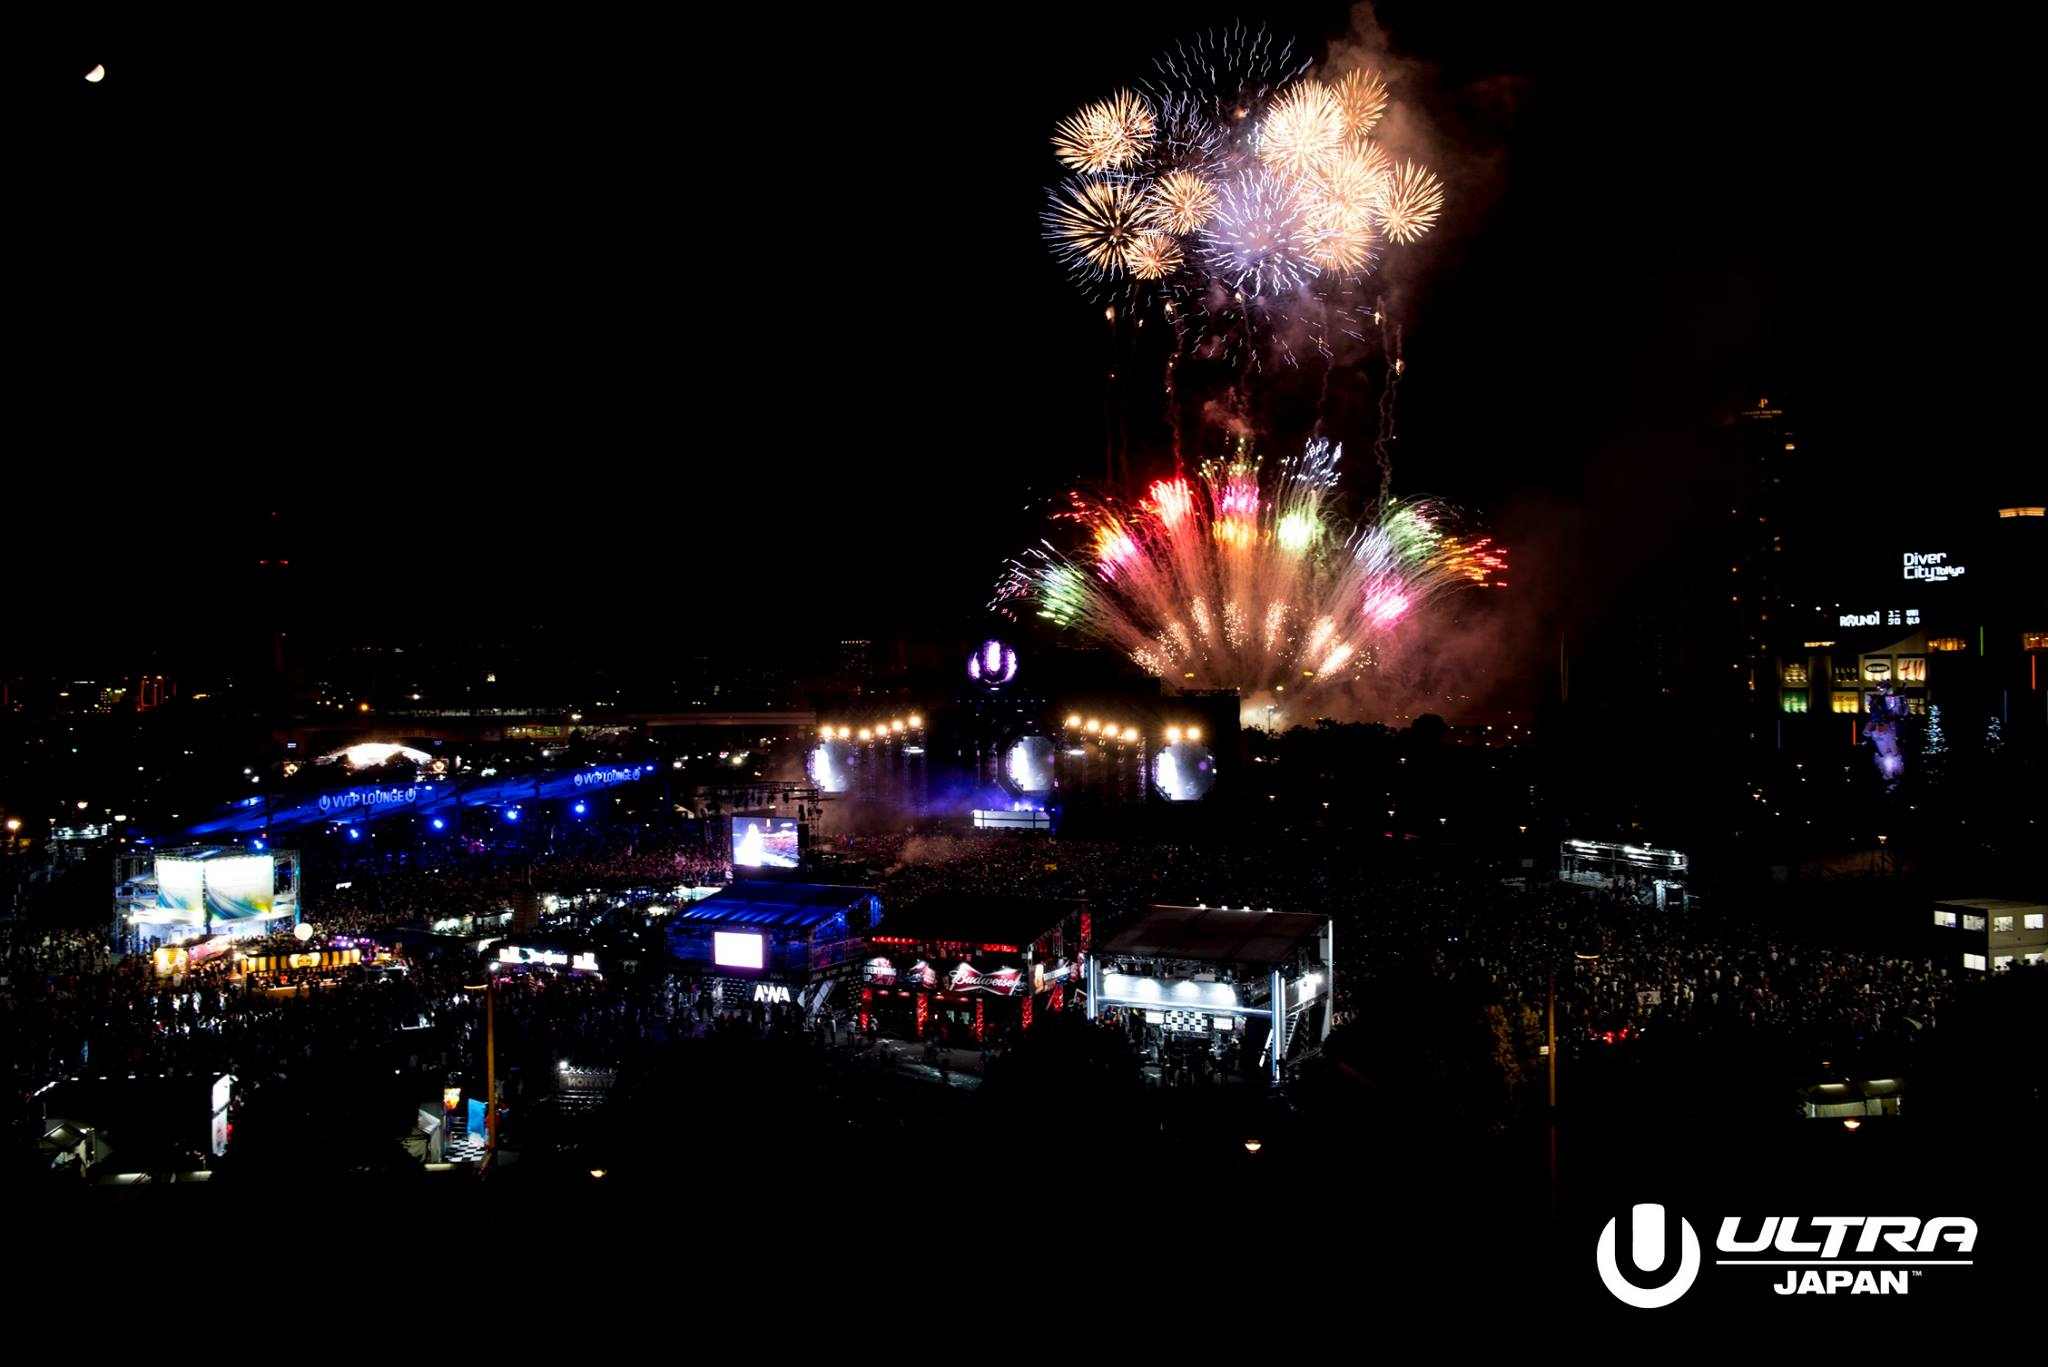 Ultra JAPAN 2015 See you again